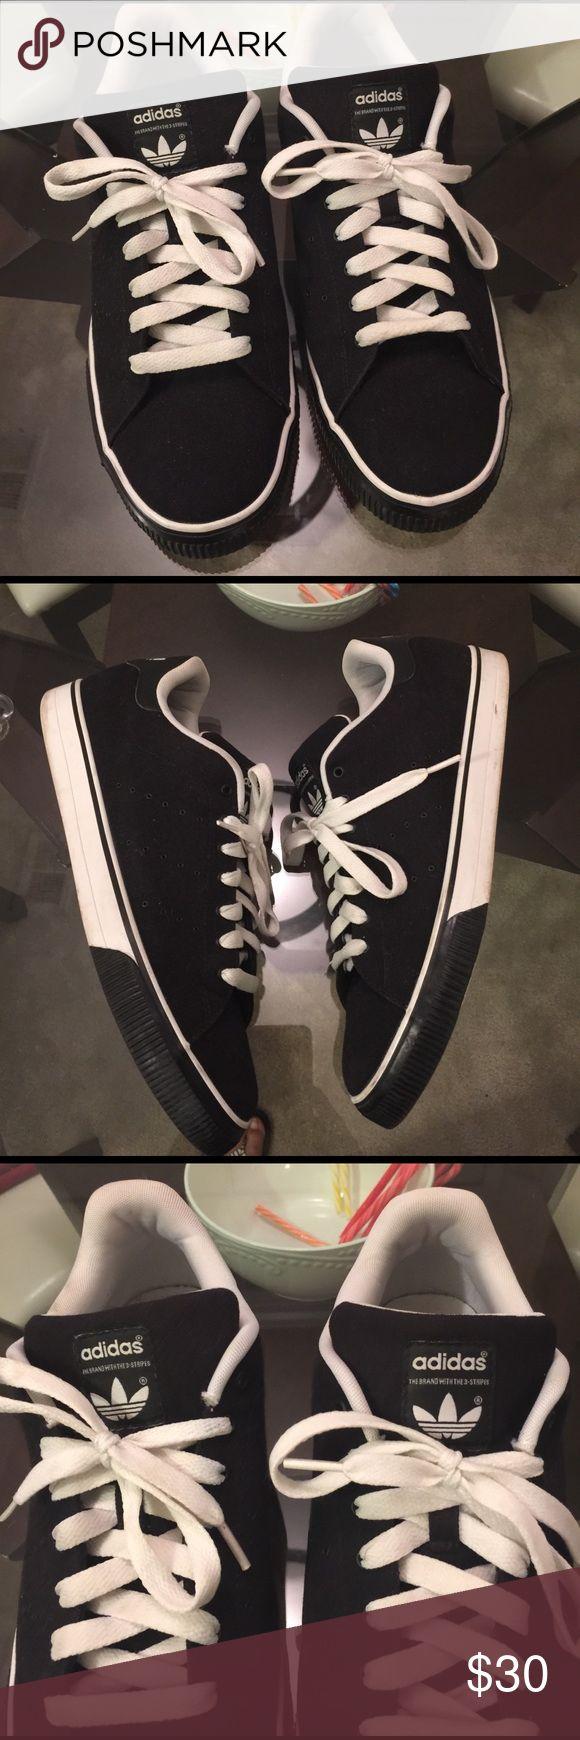 Adidas Neo Baseline Black/White Men Shoes Sneakers Superstar Lim